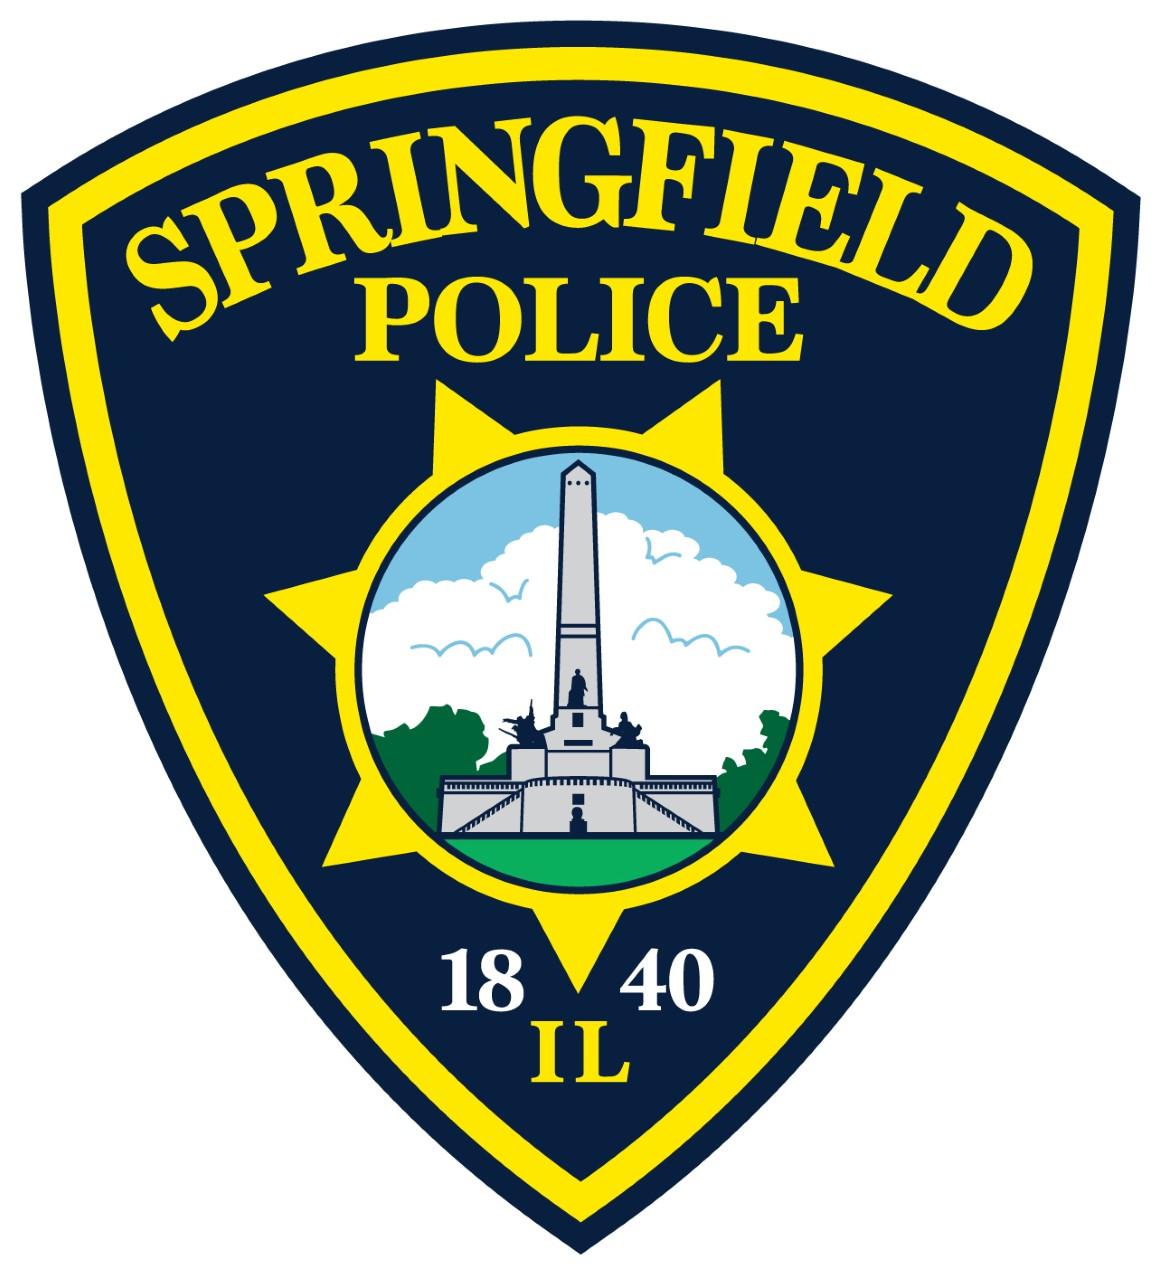 springfield police department logo_1490895523889.jpg